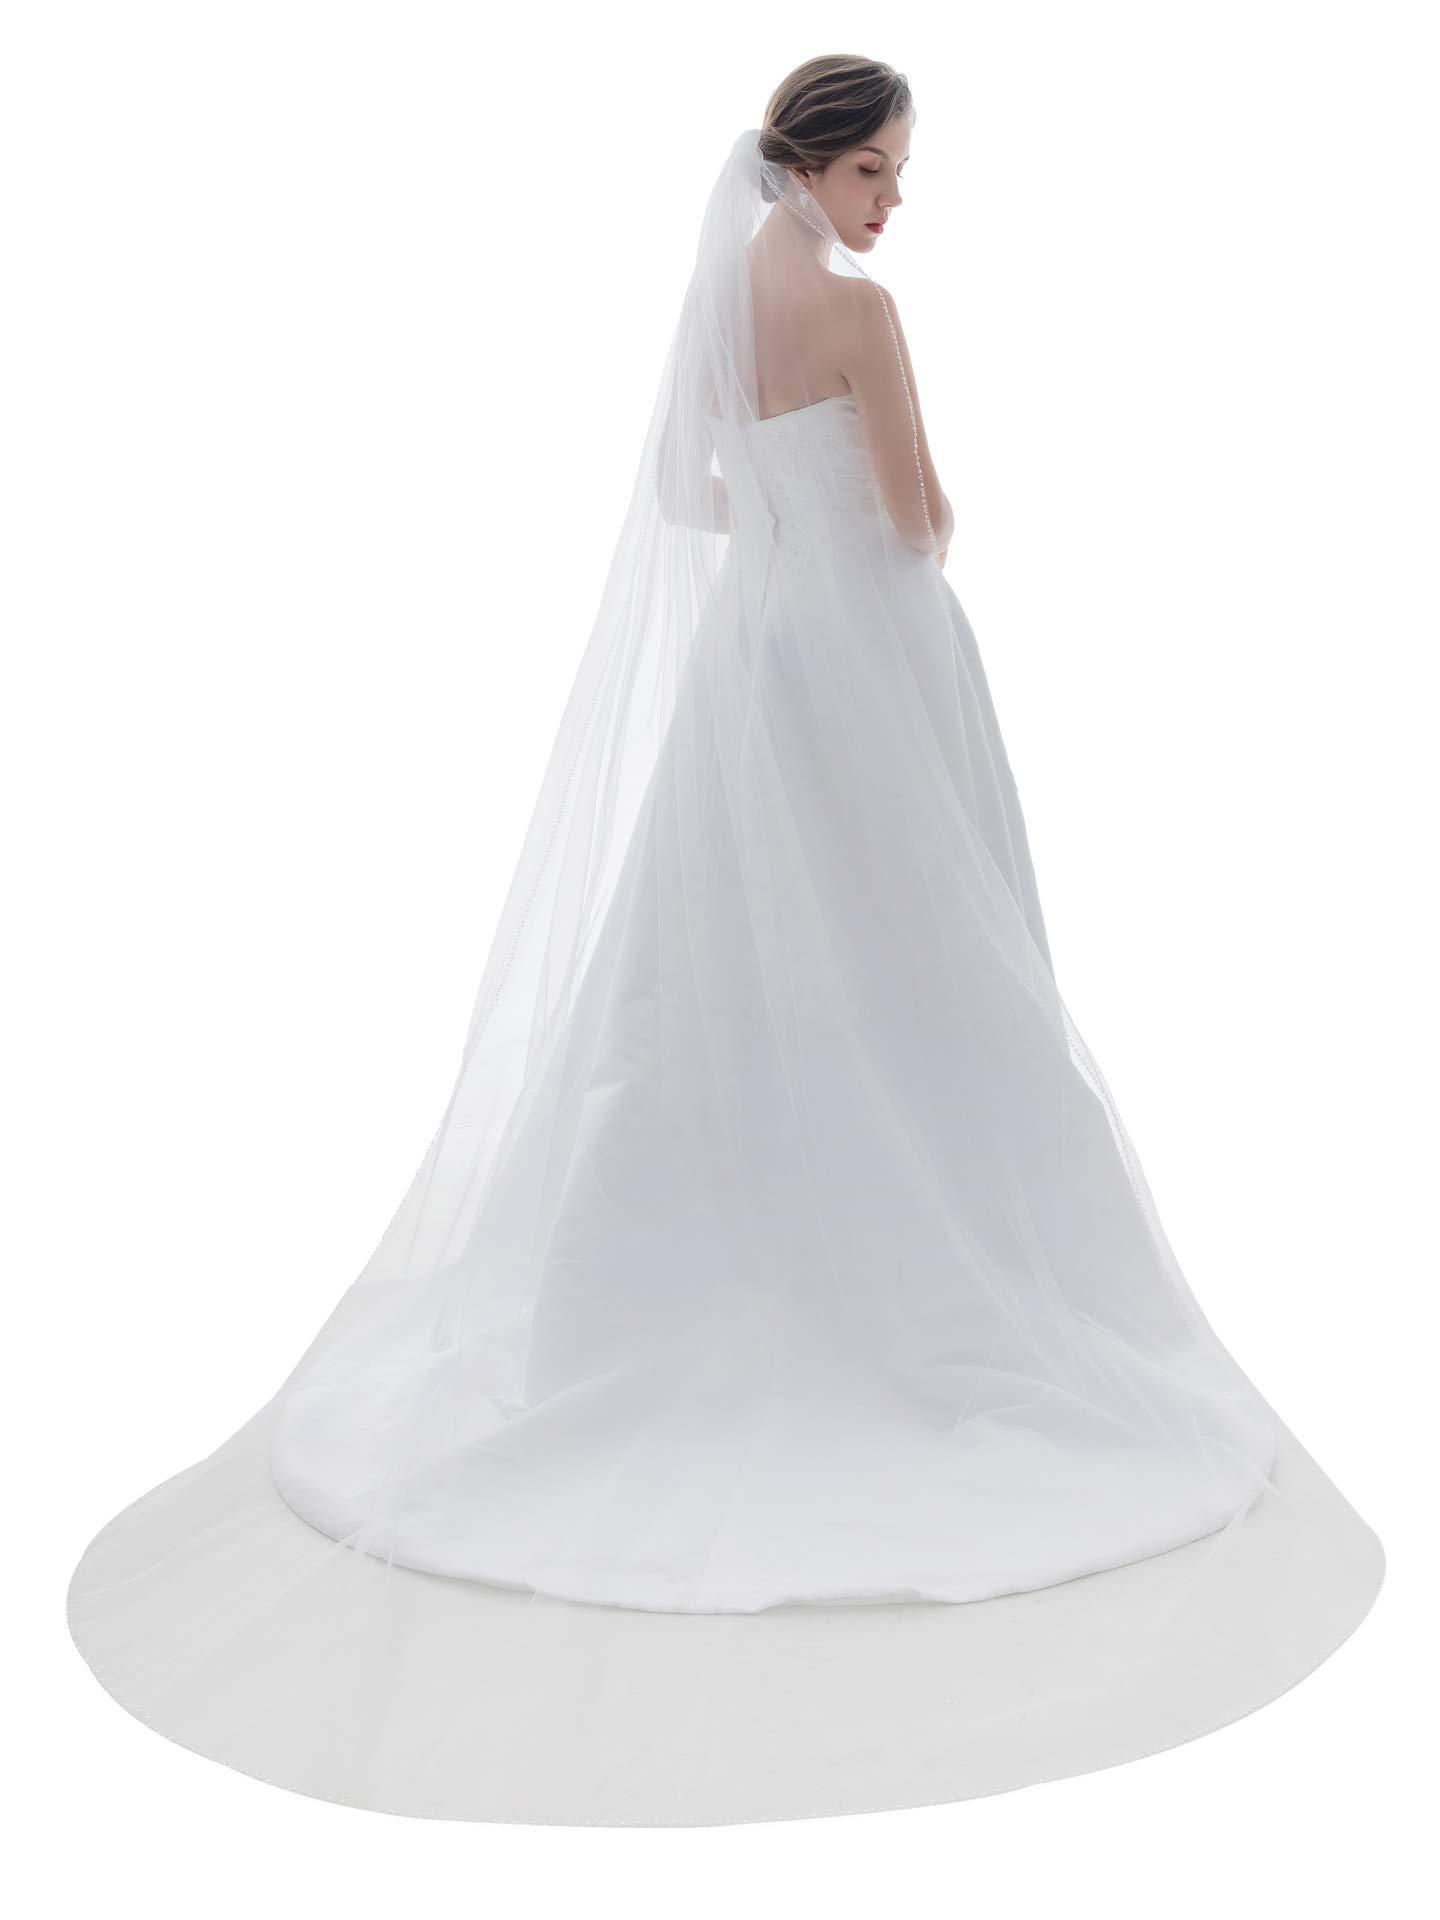 1T 1 Tier Beaded Edge Wedding Veil - Ivory Cathedral Length 108'' V120 by SAMKY